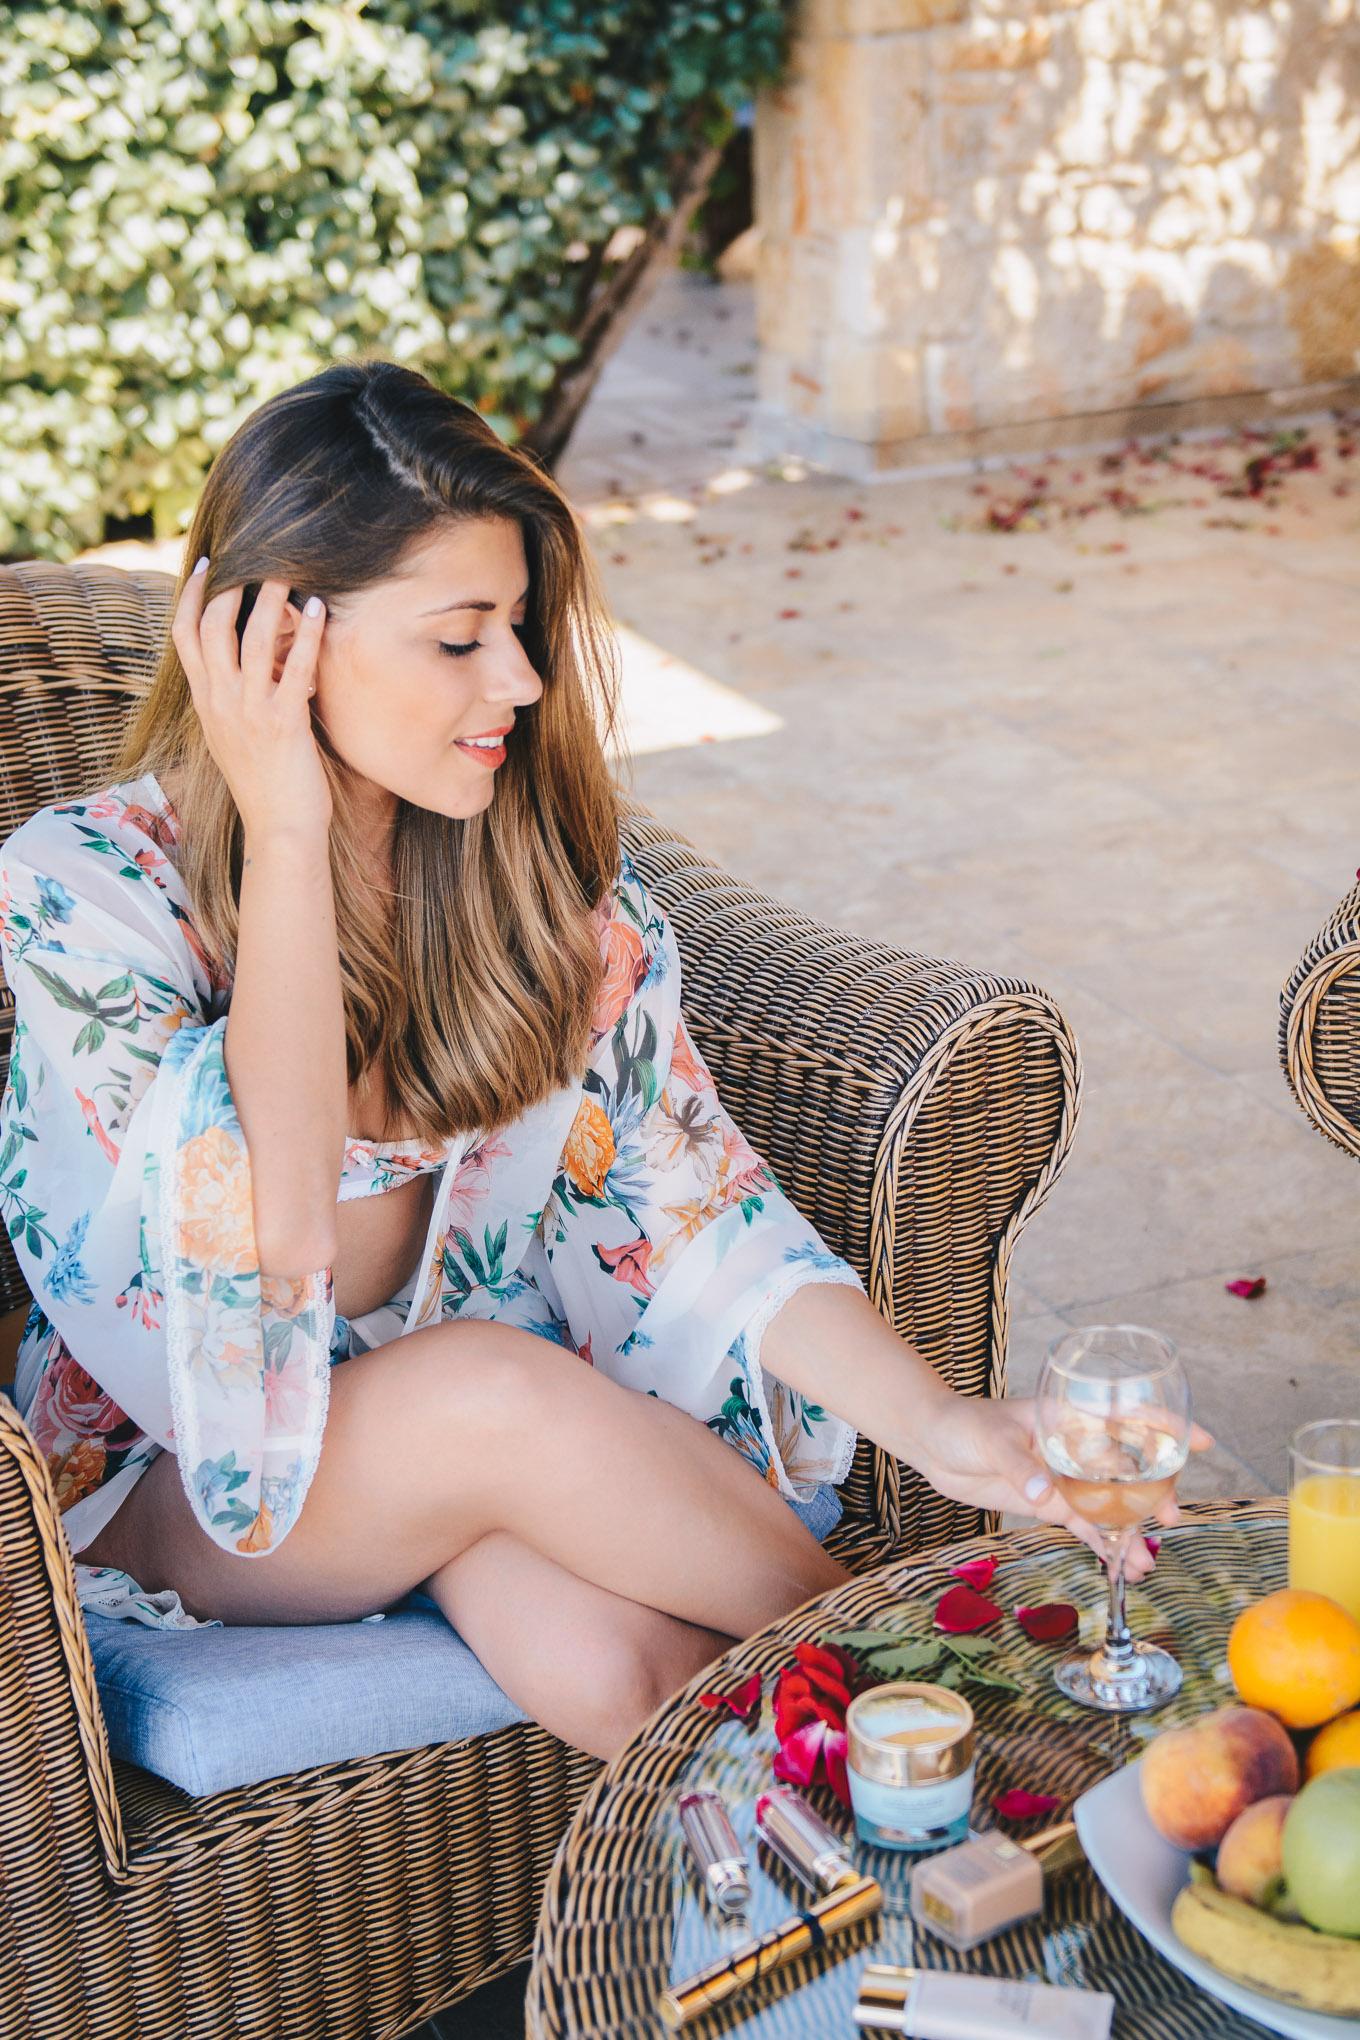 Estee lauder pure beaty blogger